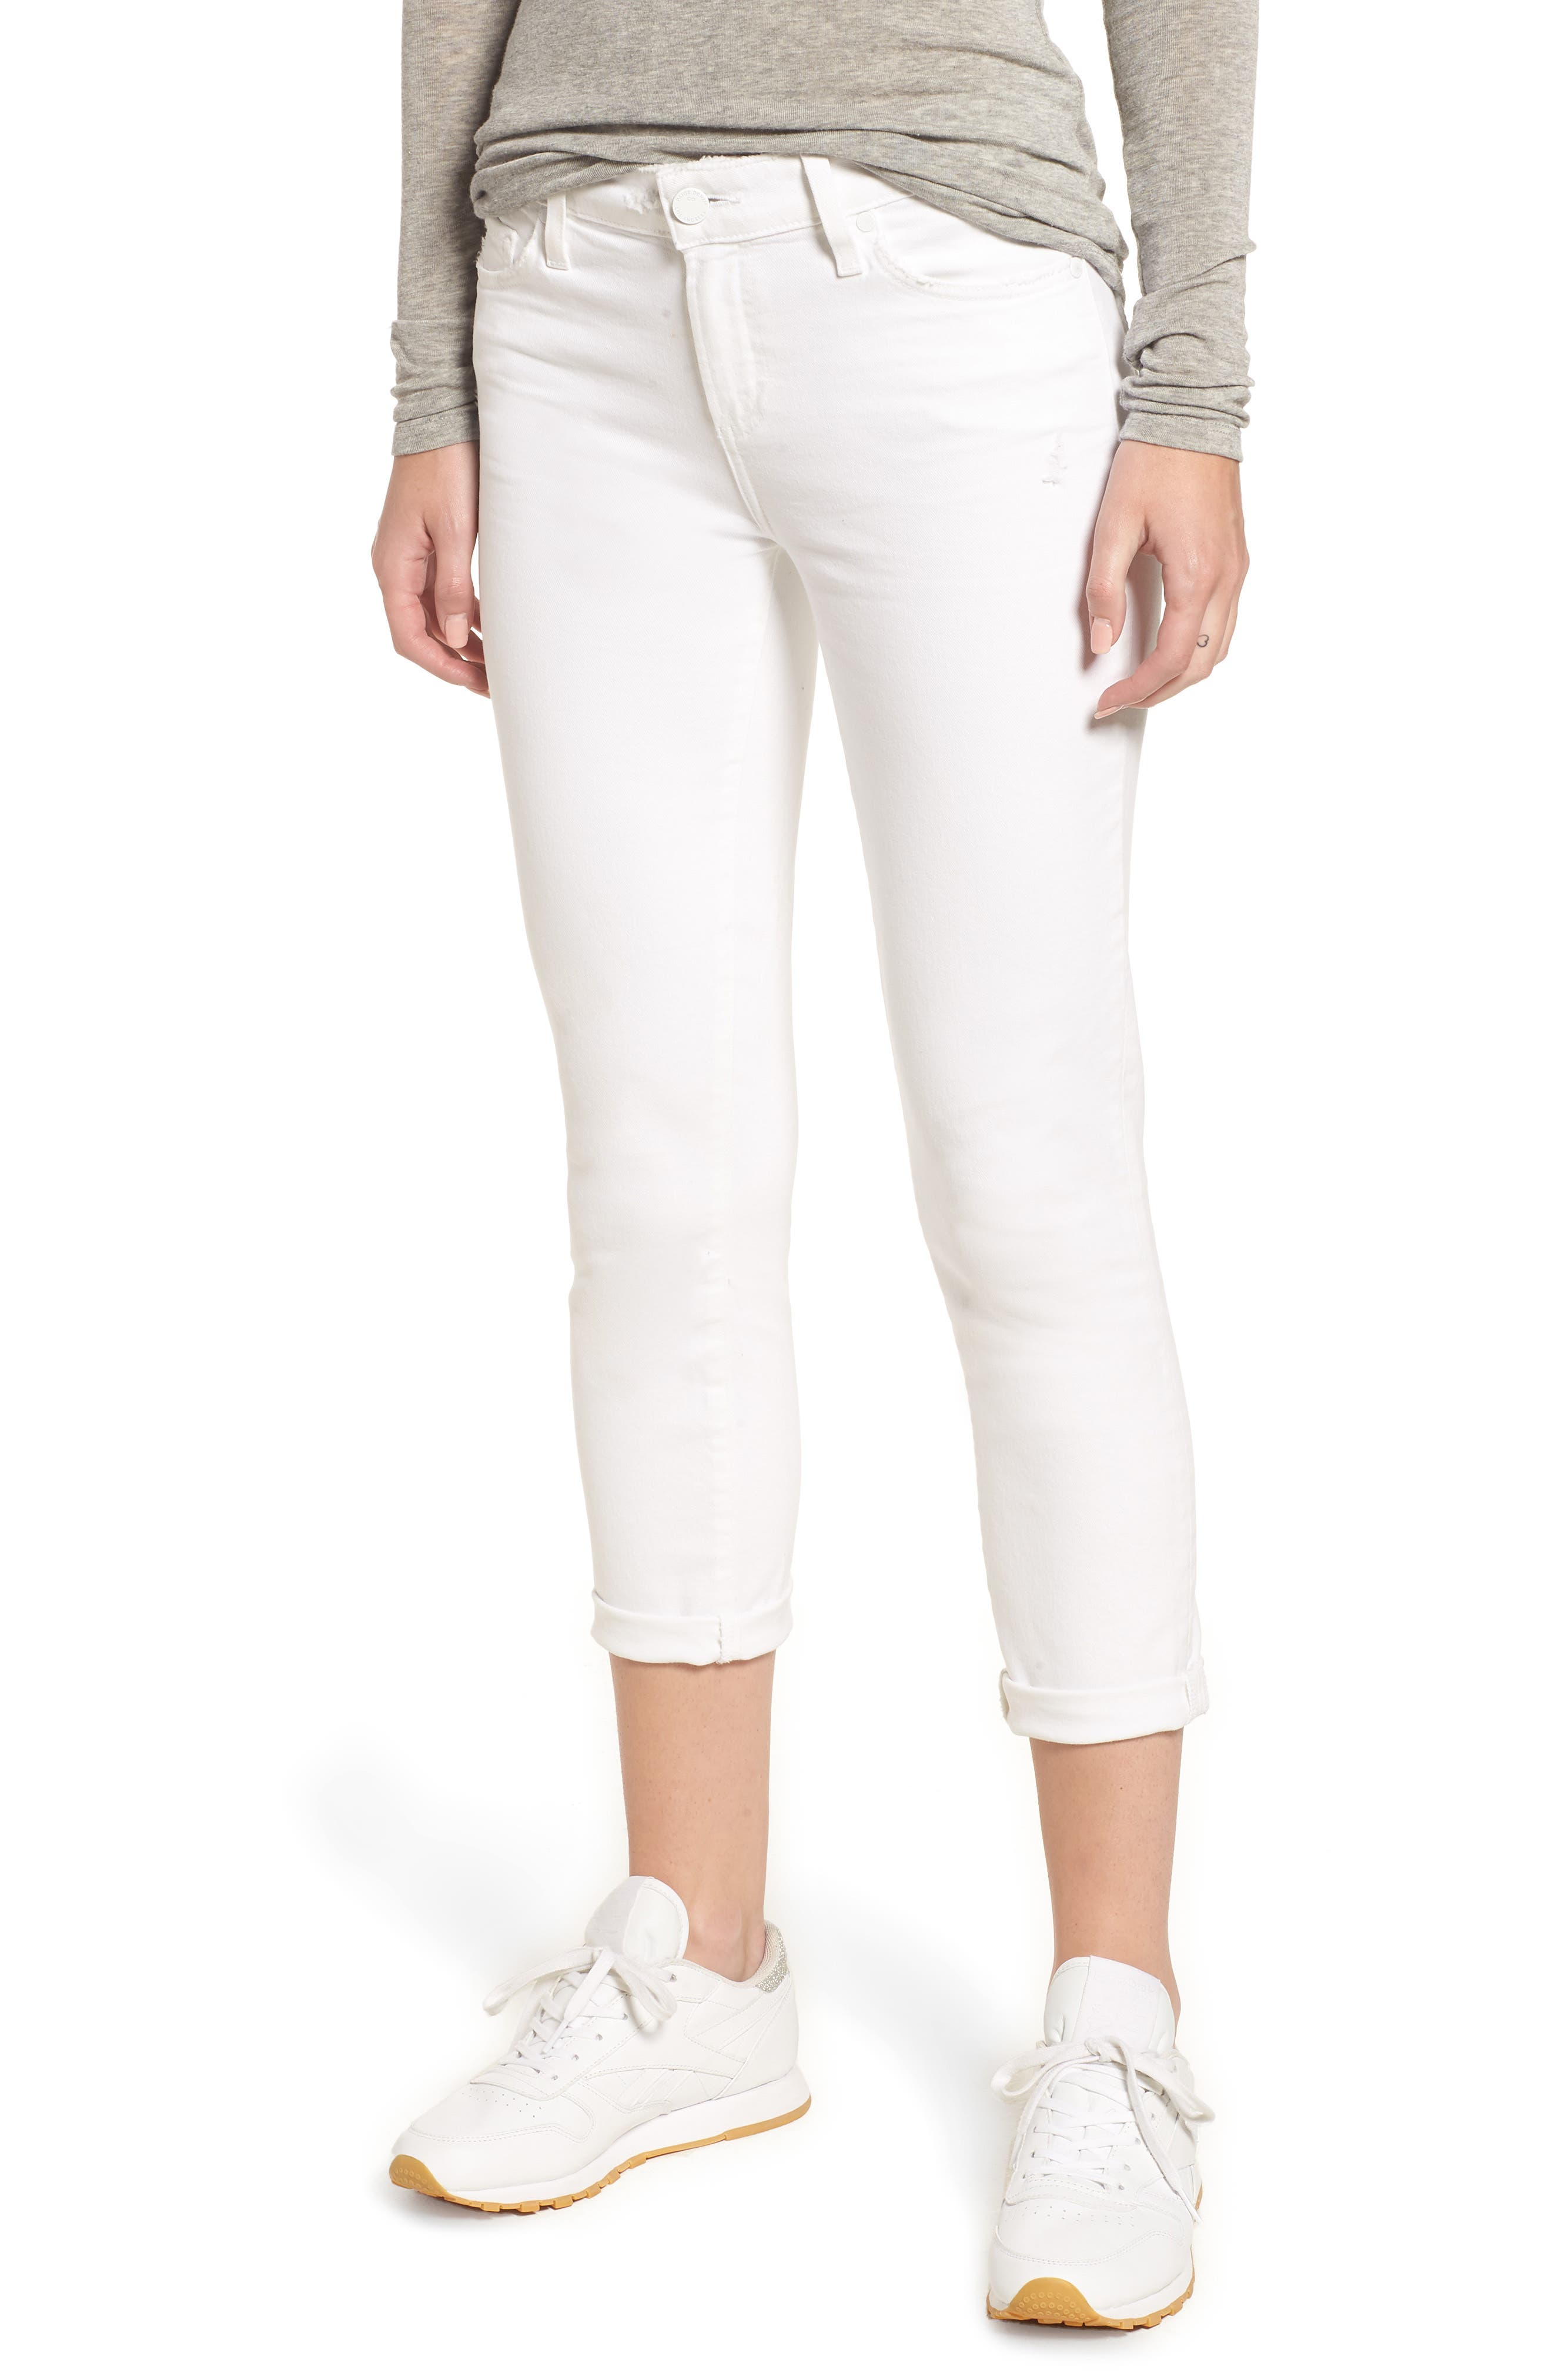 PAIGE Skyline Raw Hem Crop Skinny Jeans, Main, color, LIVED IN CRISP WHITE